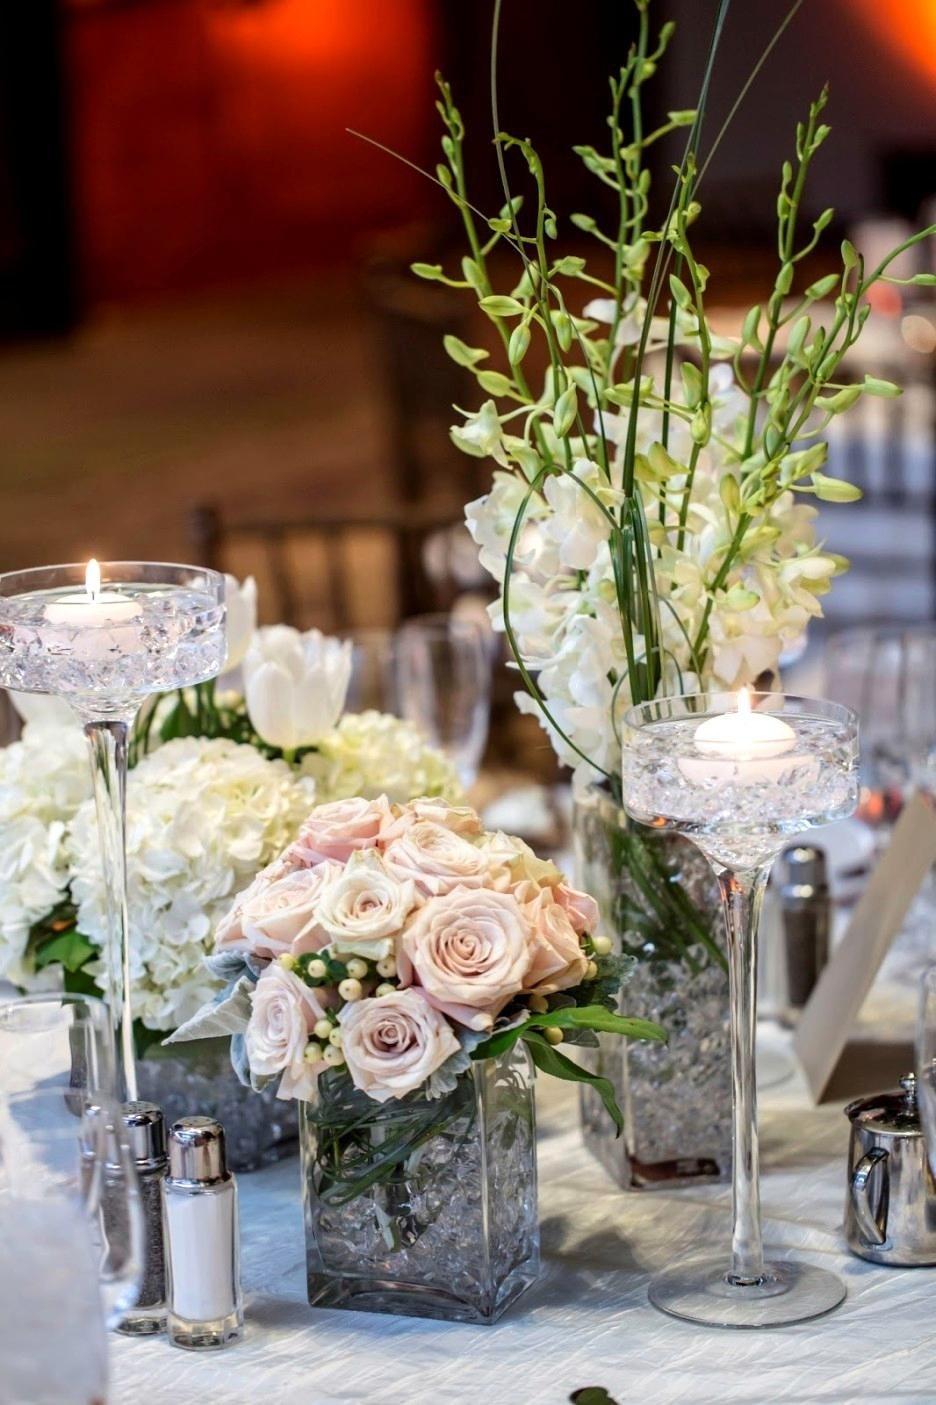 10 Most Recommended Vase Decoration Ideas Table Centerpieces impressive glass vase decorations centerpieces delightful candle 2020